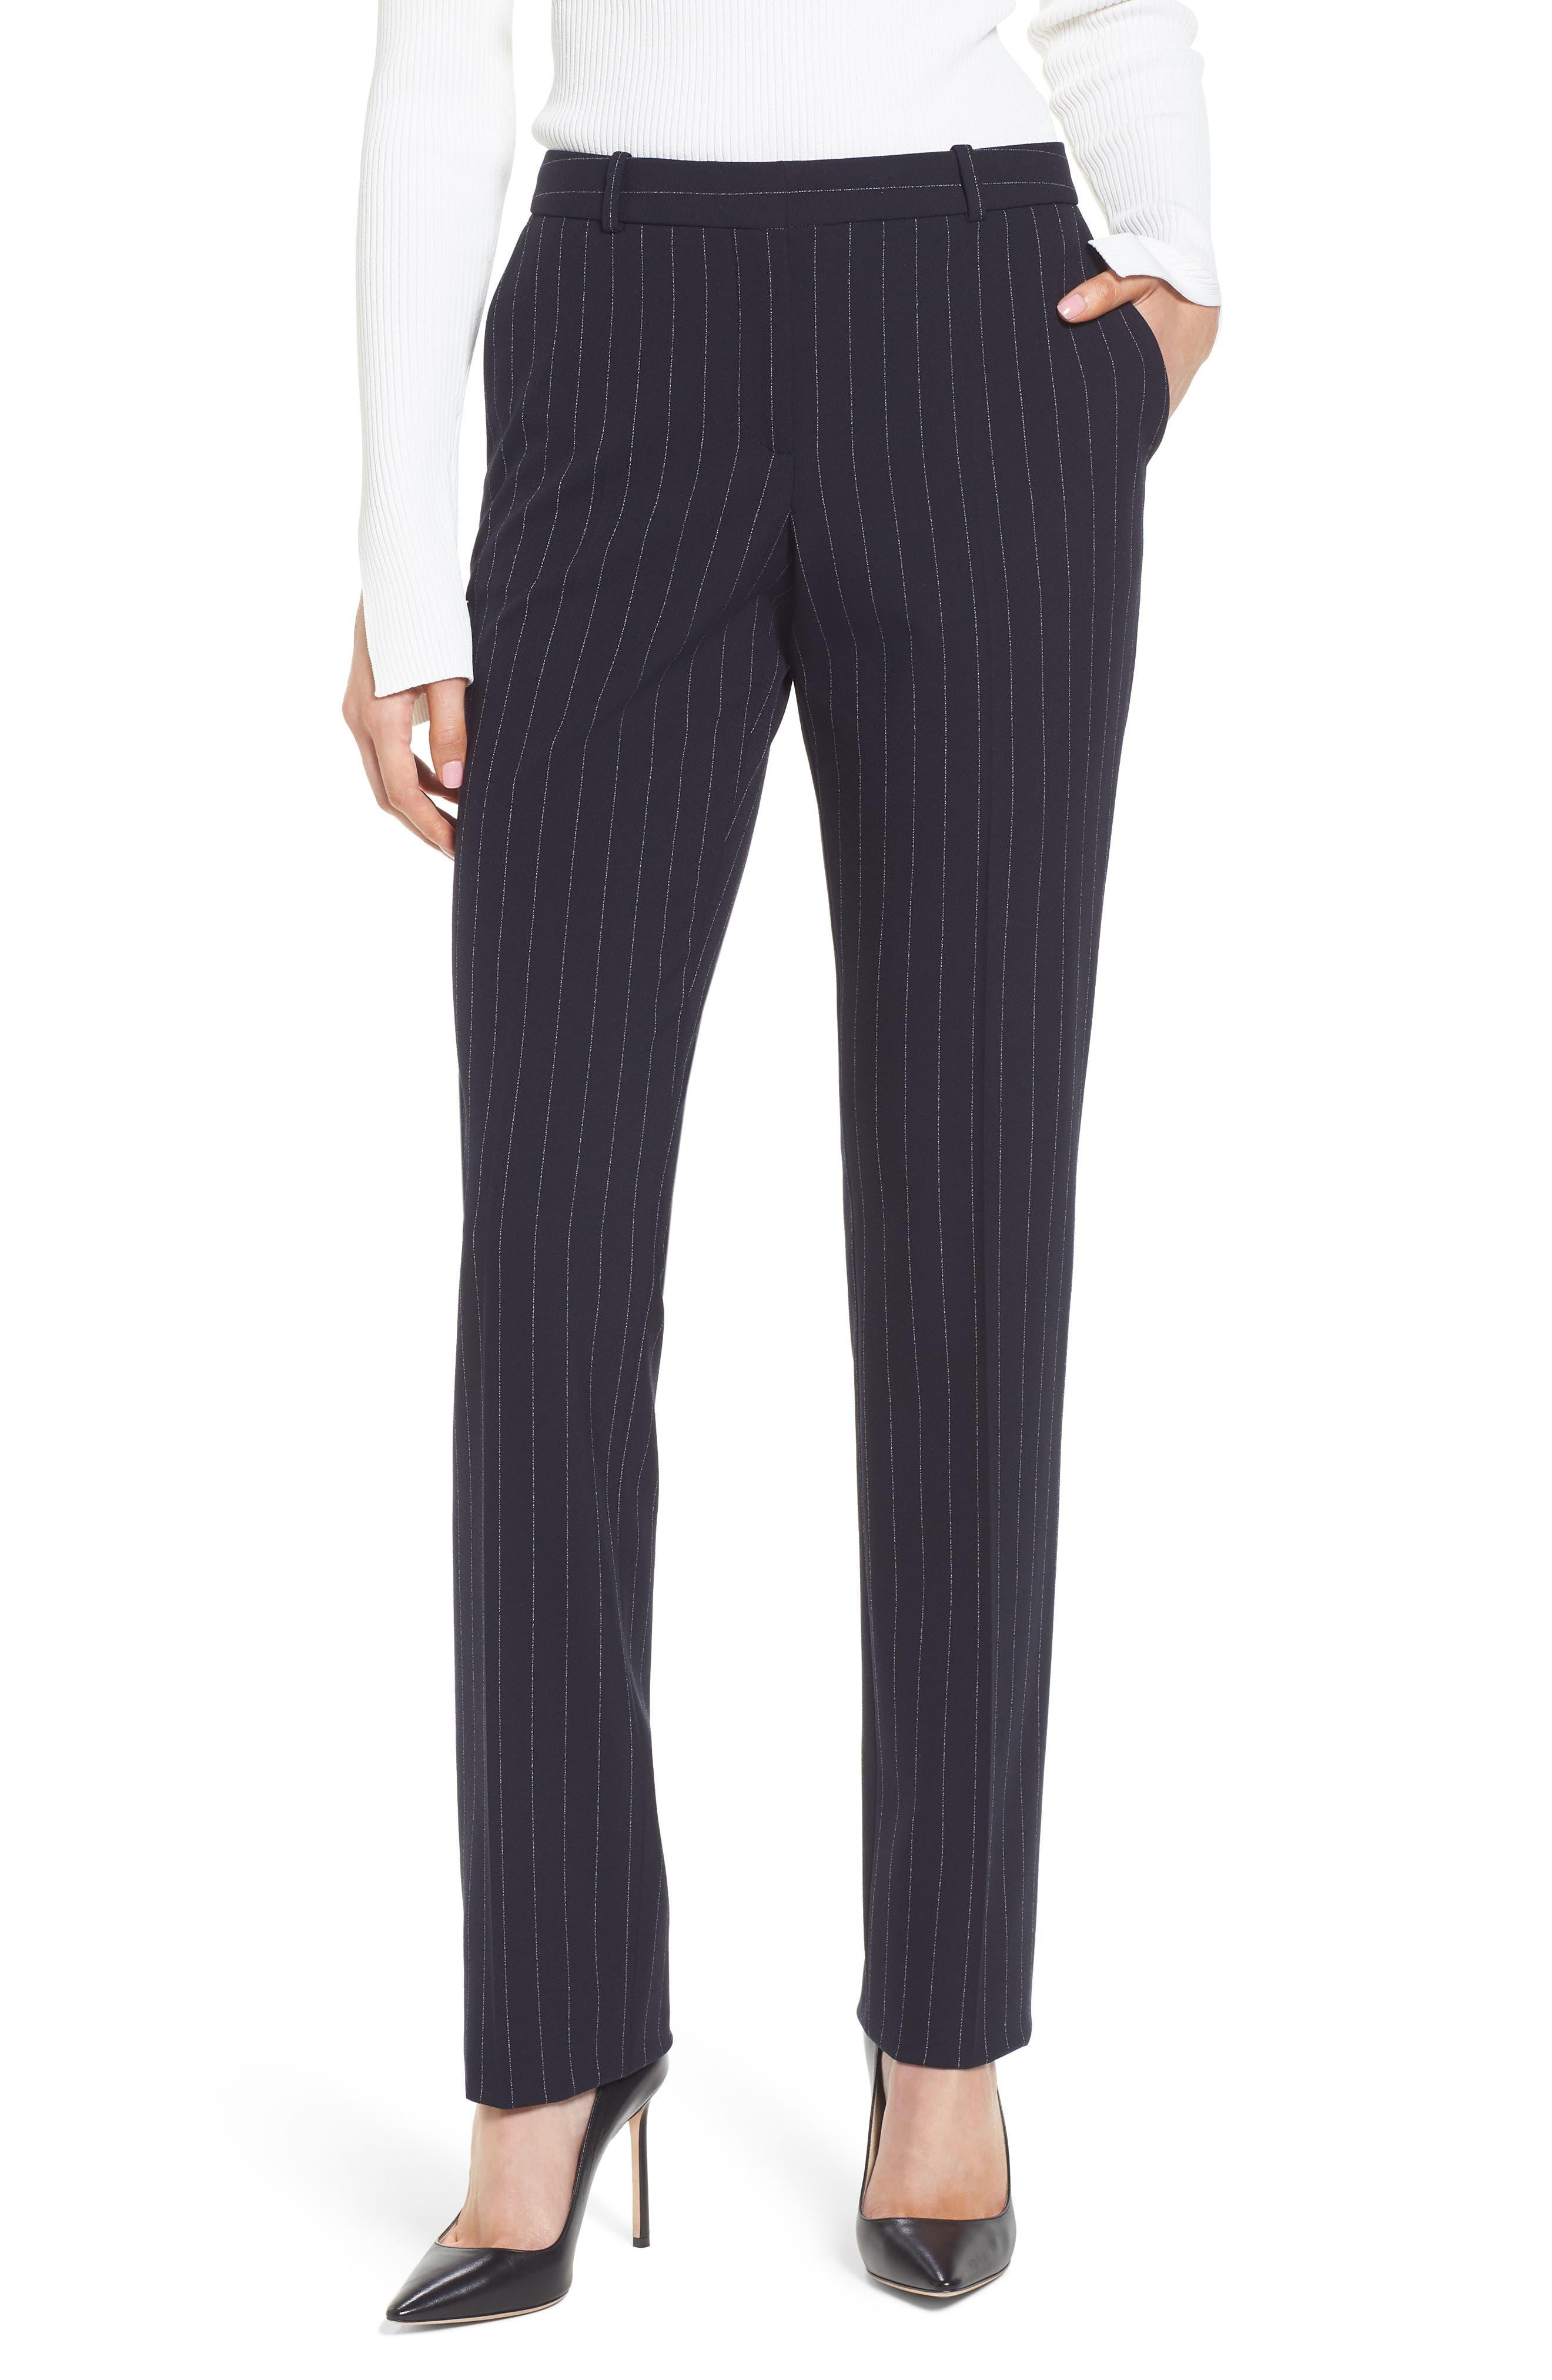 Titana Pinstripe Suit Trousers,                             Main thumbnail 1, color,                             Navy Fantasy